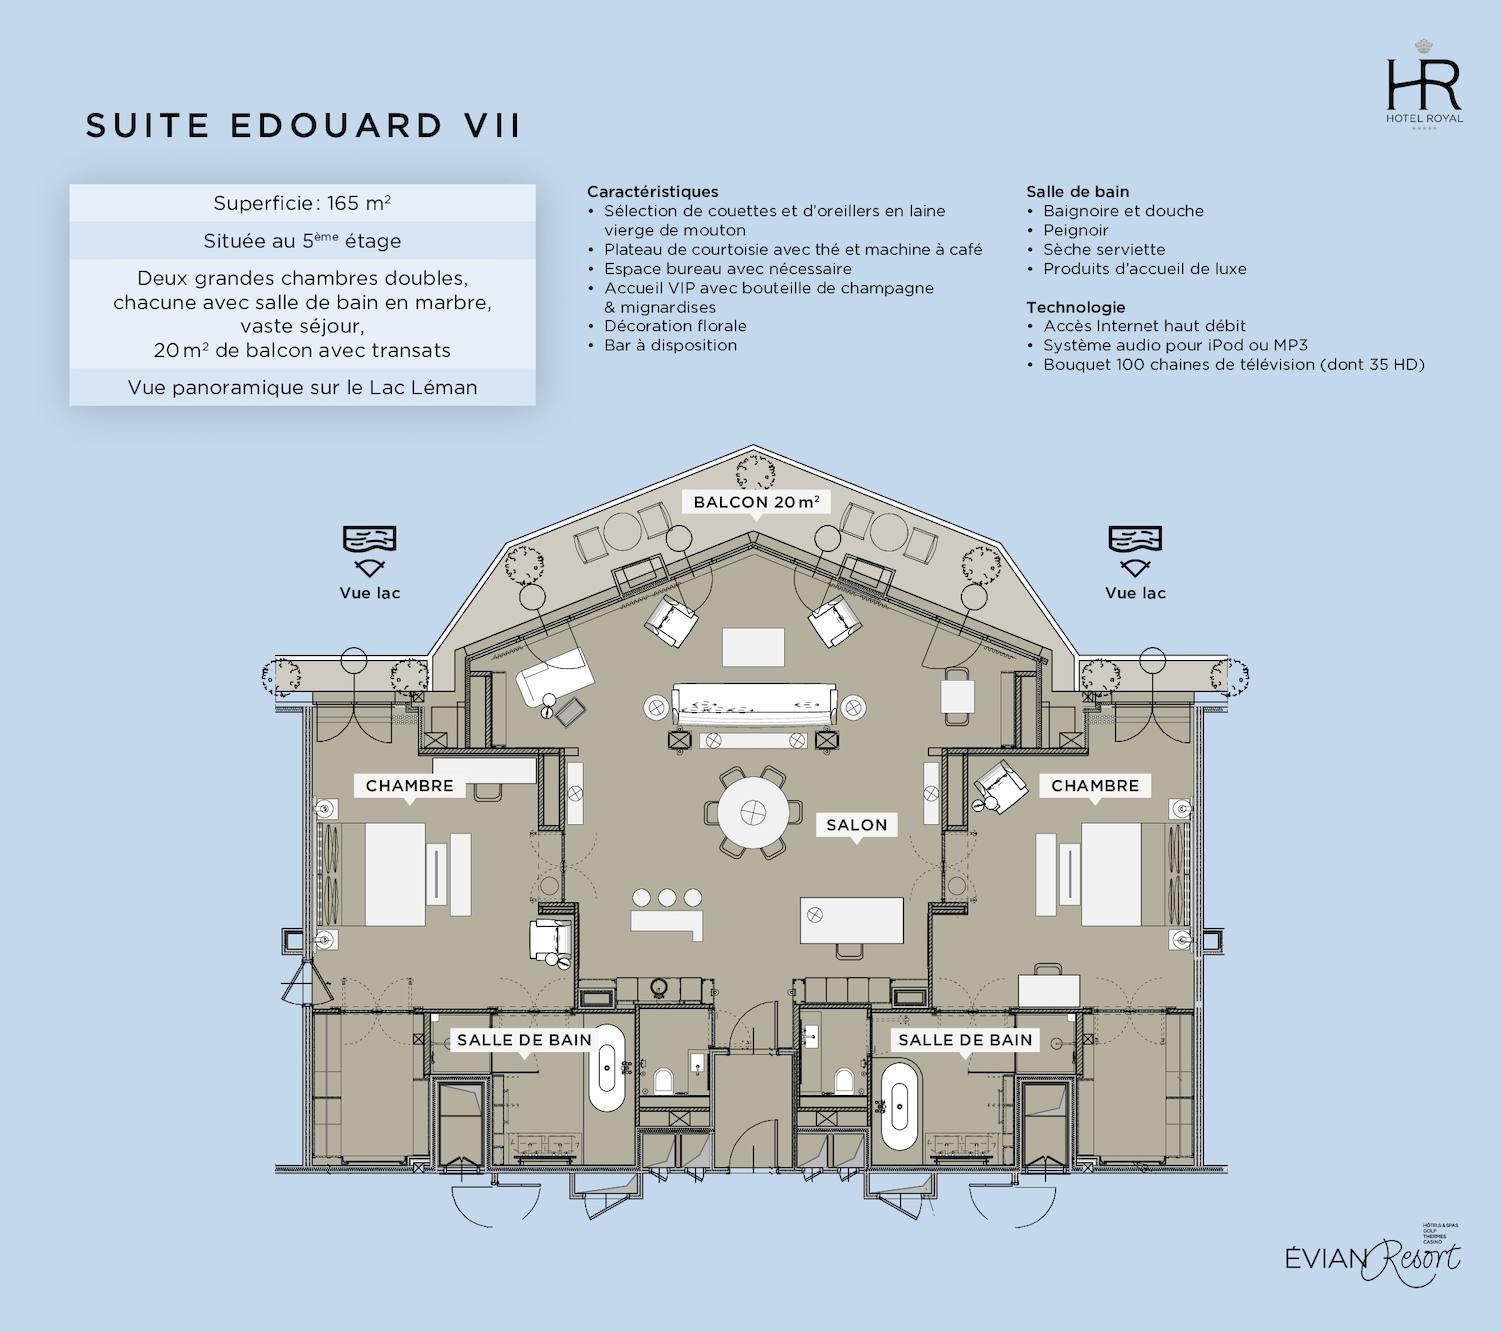 calam o suite edouard vii h tel royal evian fr. Black Bedroom Furniture Sets. Home Design Ideas